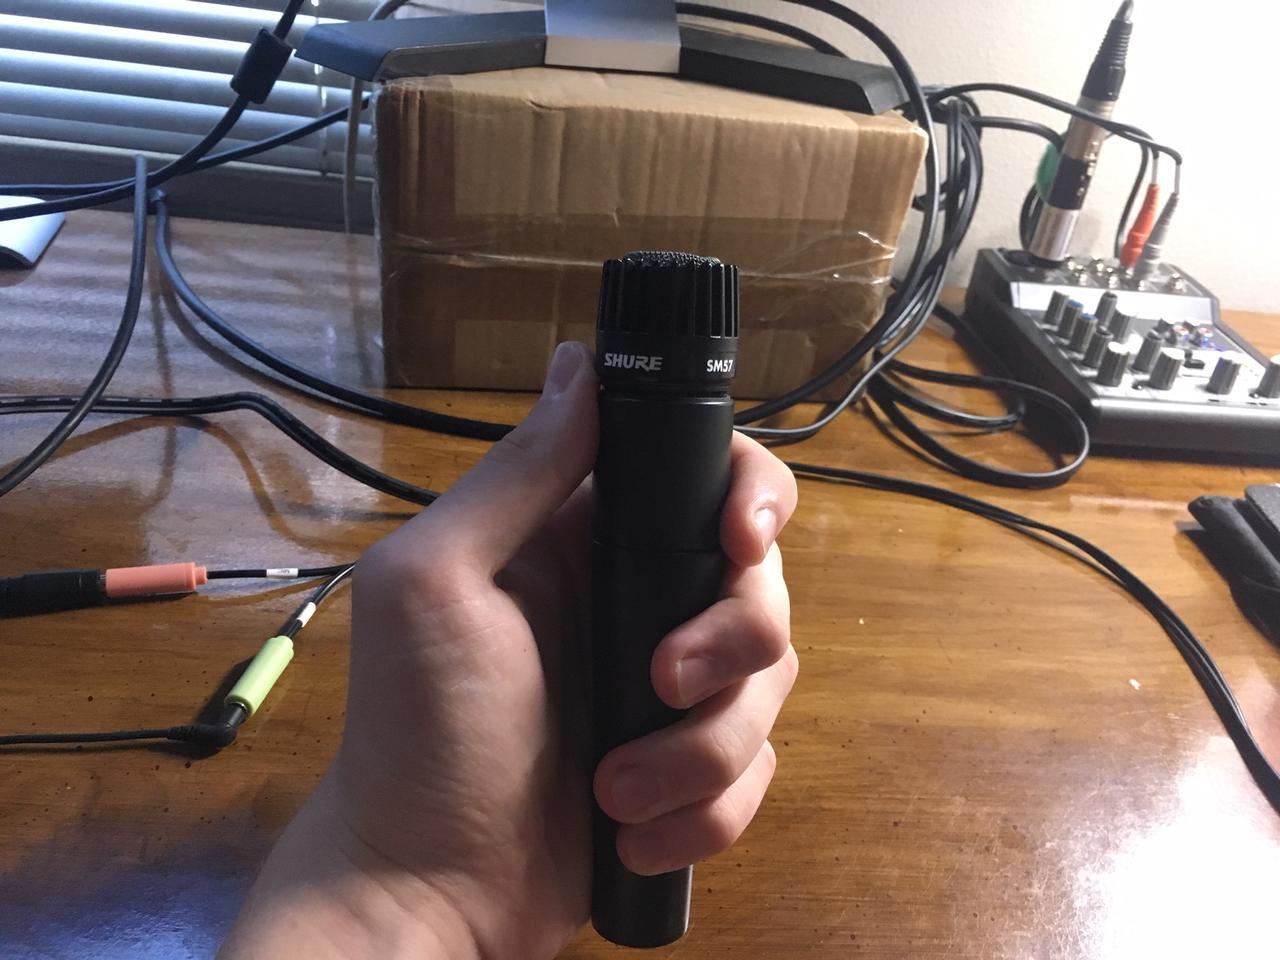 A Shure SM57 microphone